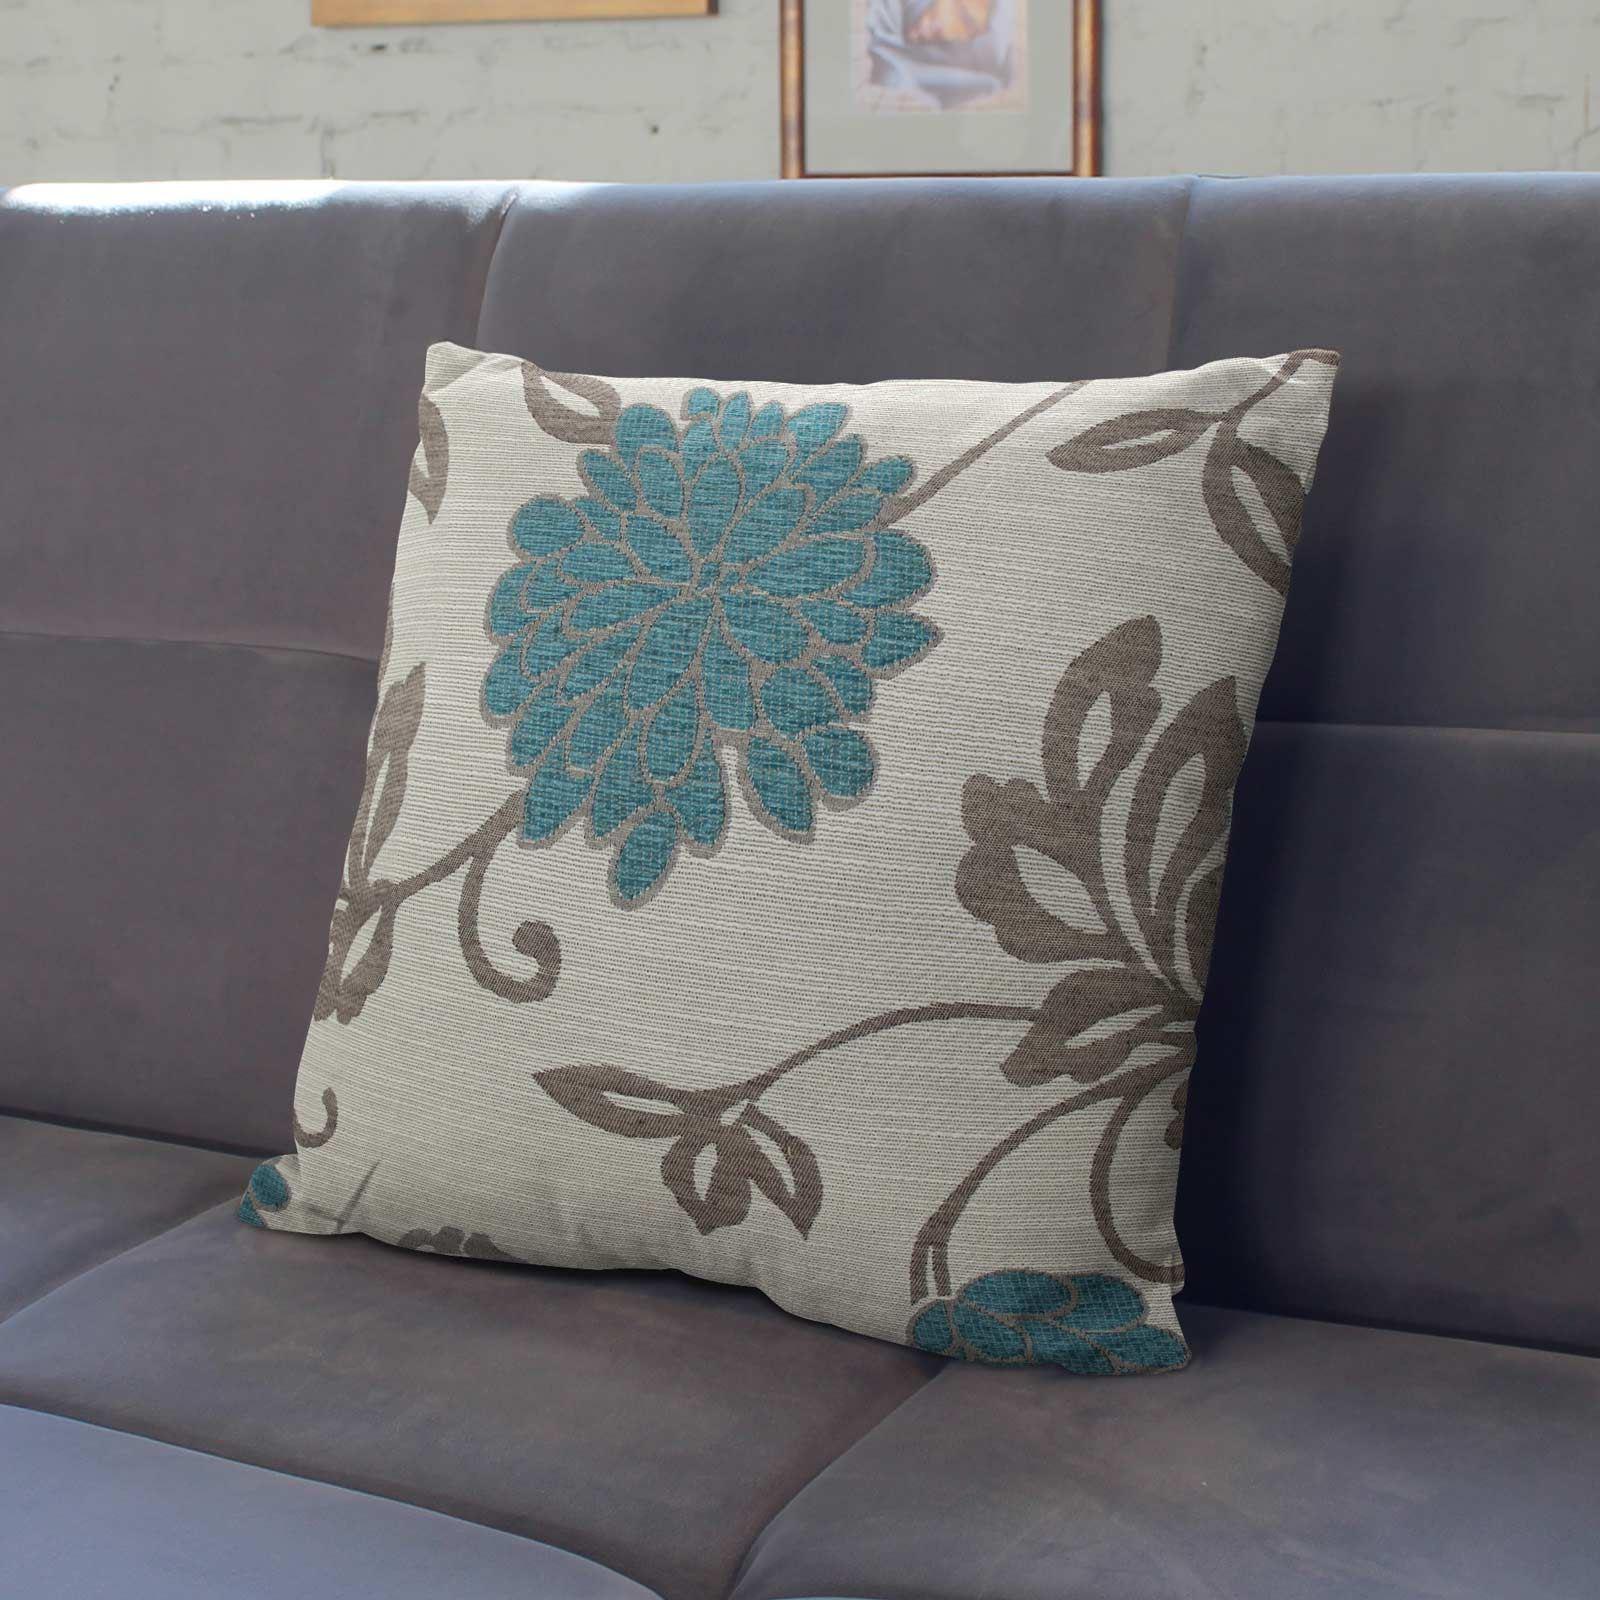 Teal-Blue-Duck-Egg-Cushion-Covers-18-034-x18-034-45cm-x-45cm-Luxury-Cover thumbnail 26